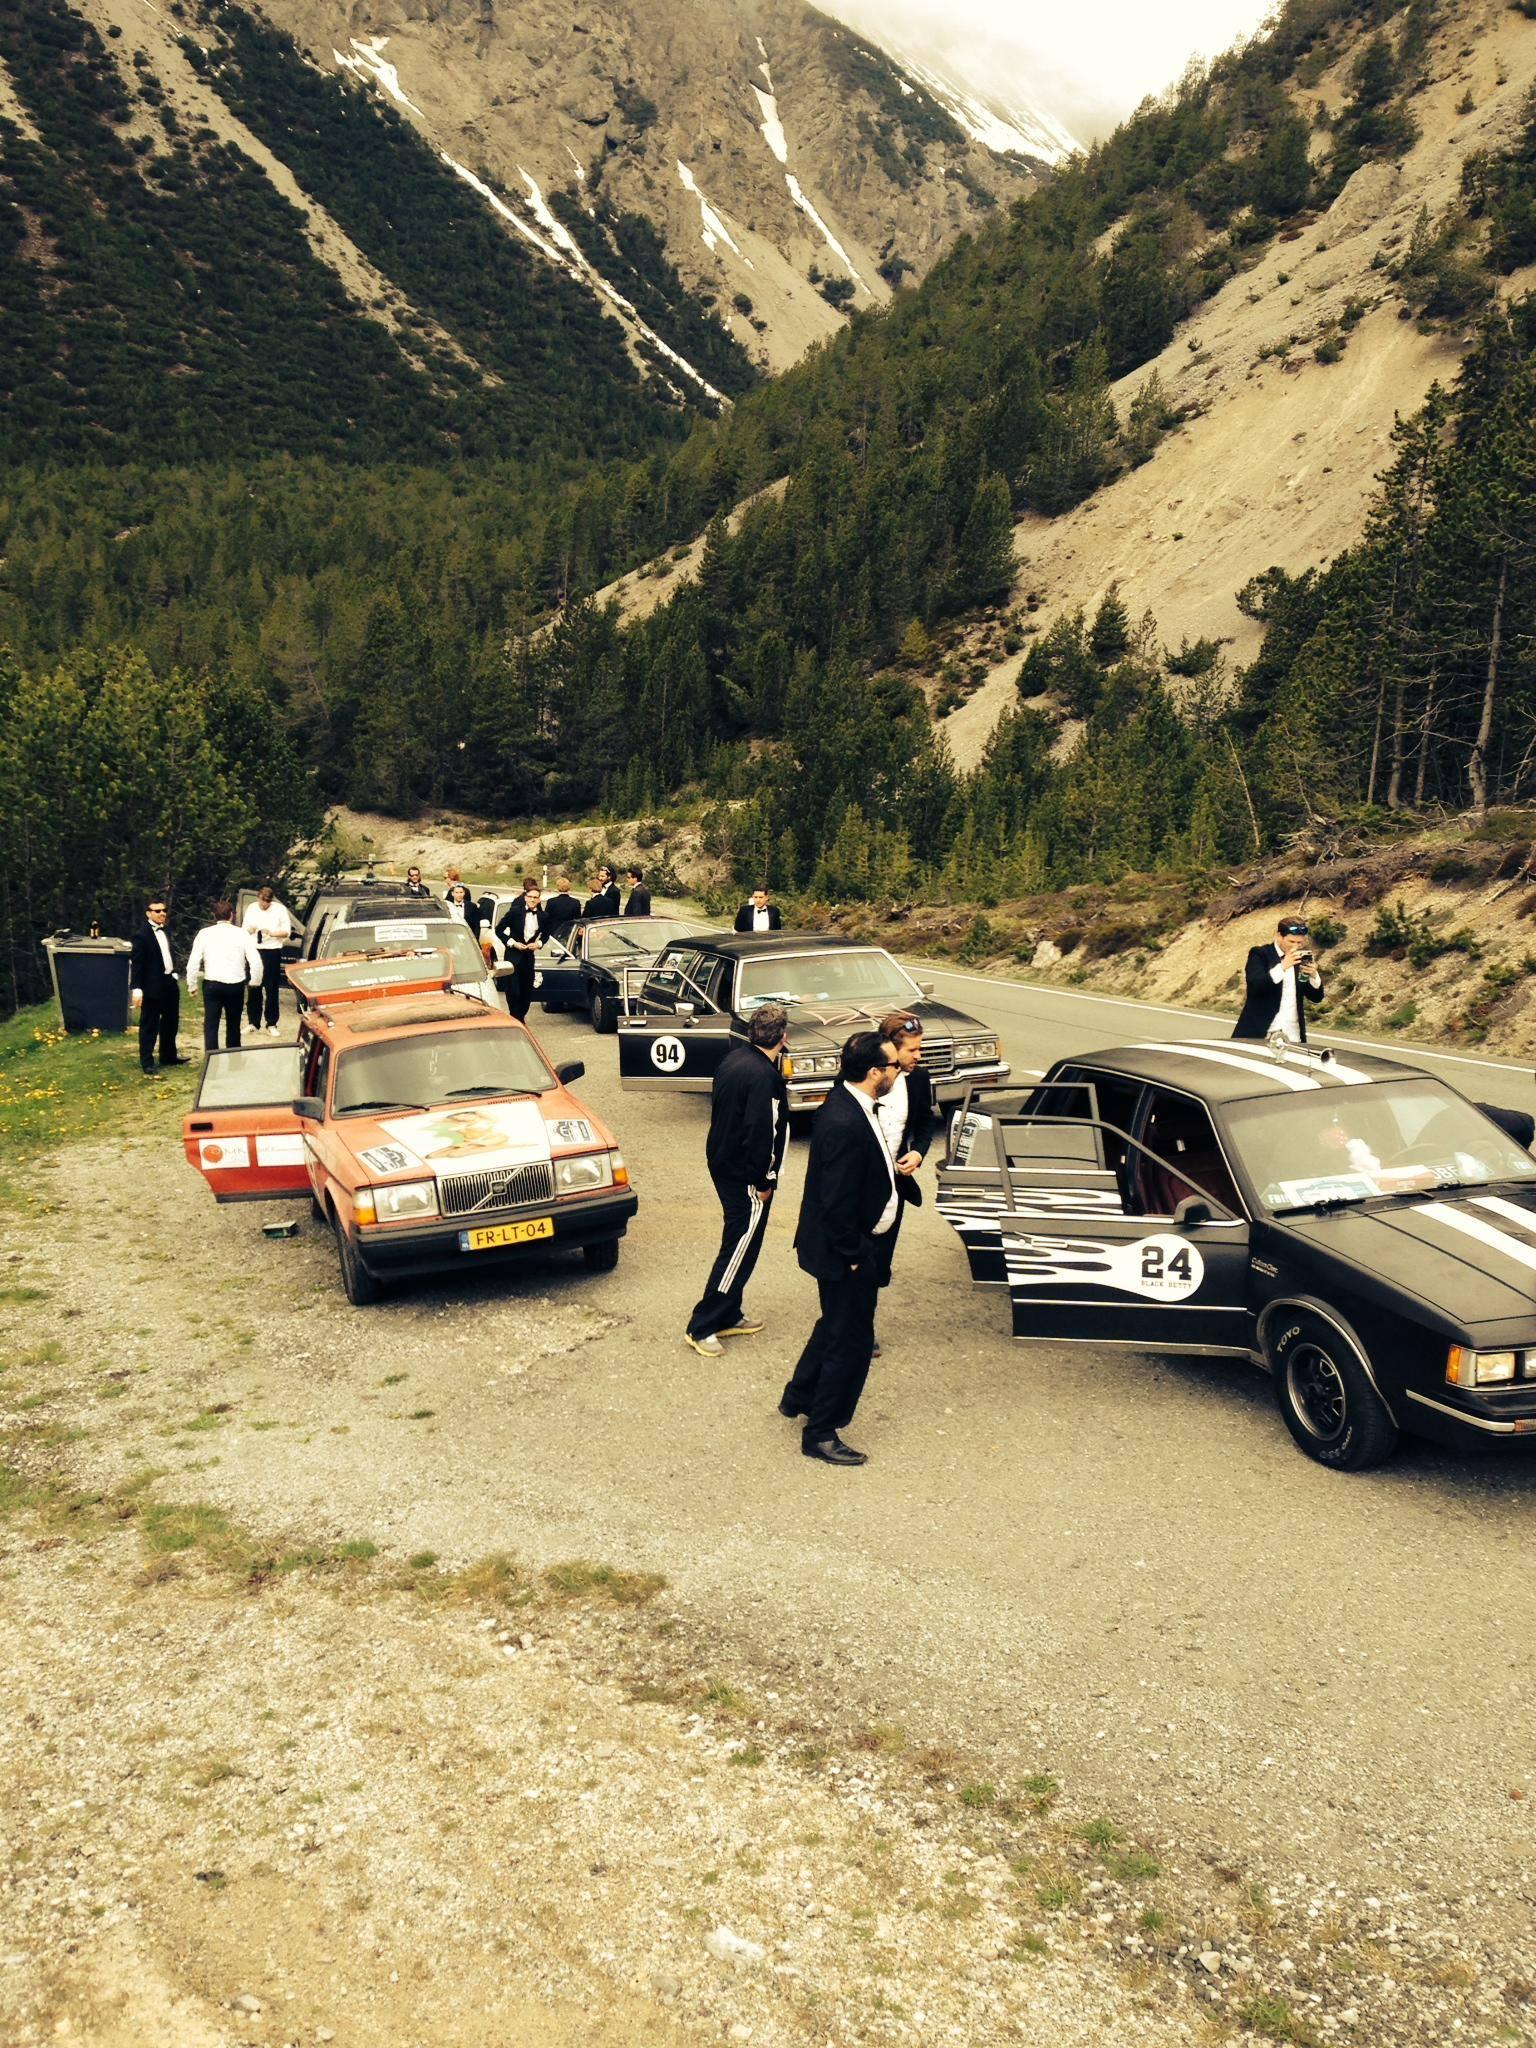 H.D. Dagobert Classic Car Rally - LUSTRUM IV